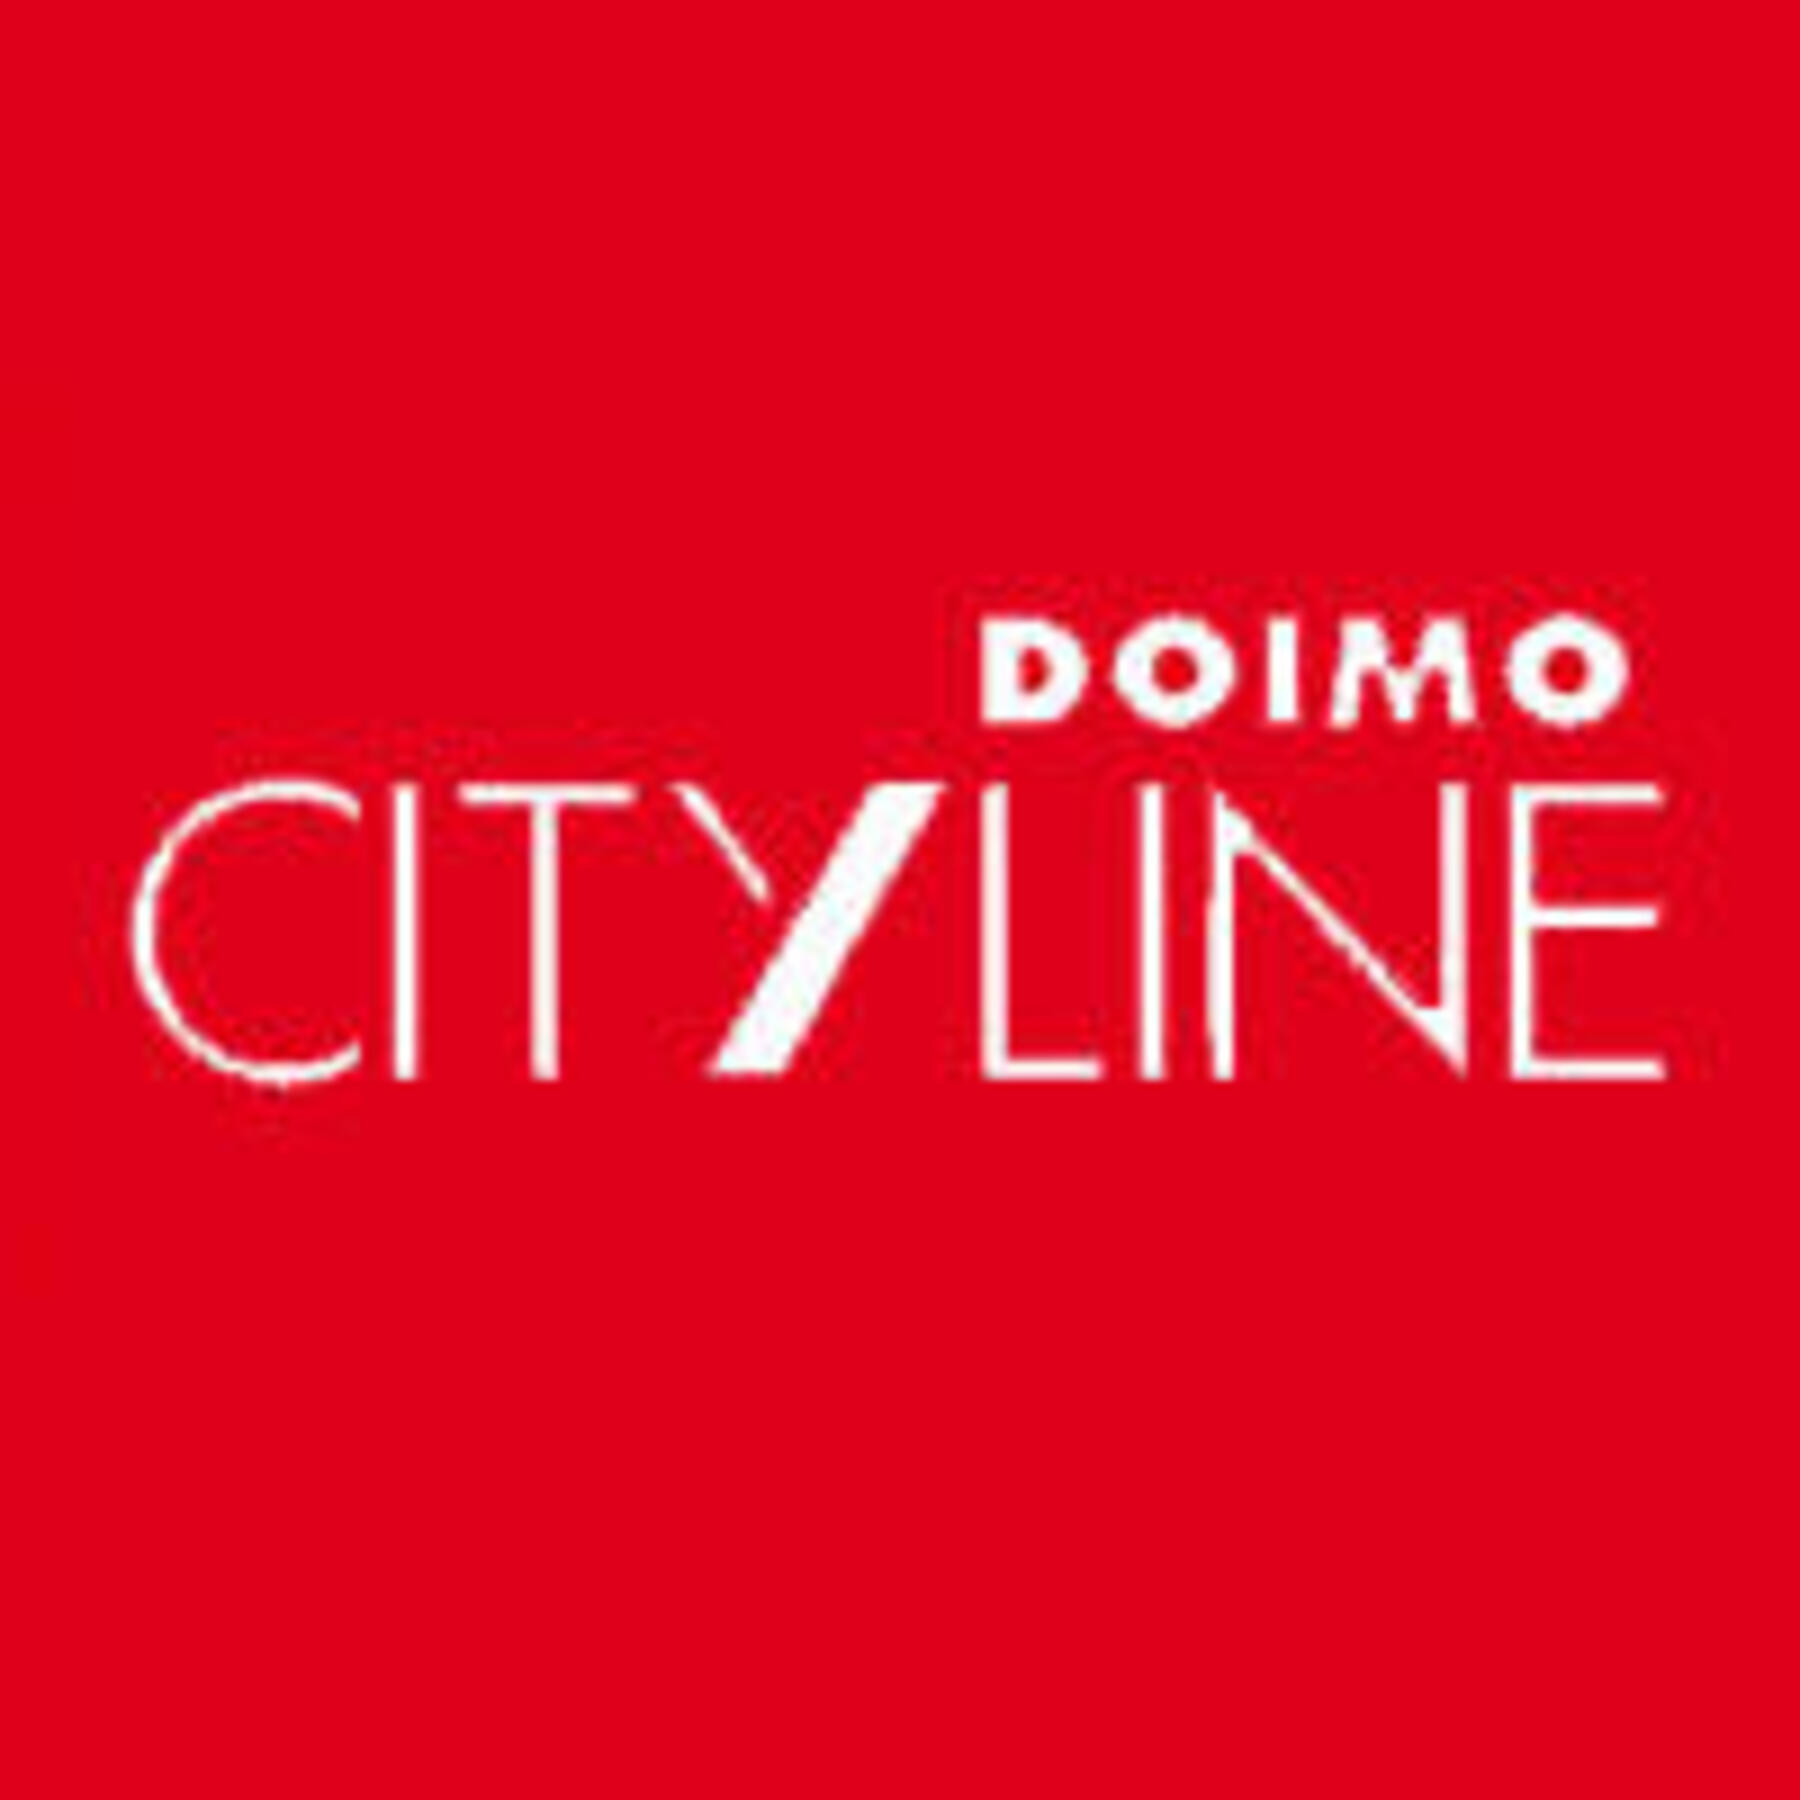 797868 1800 0751 797533 732071 200x200  0751 doimo city